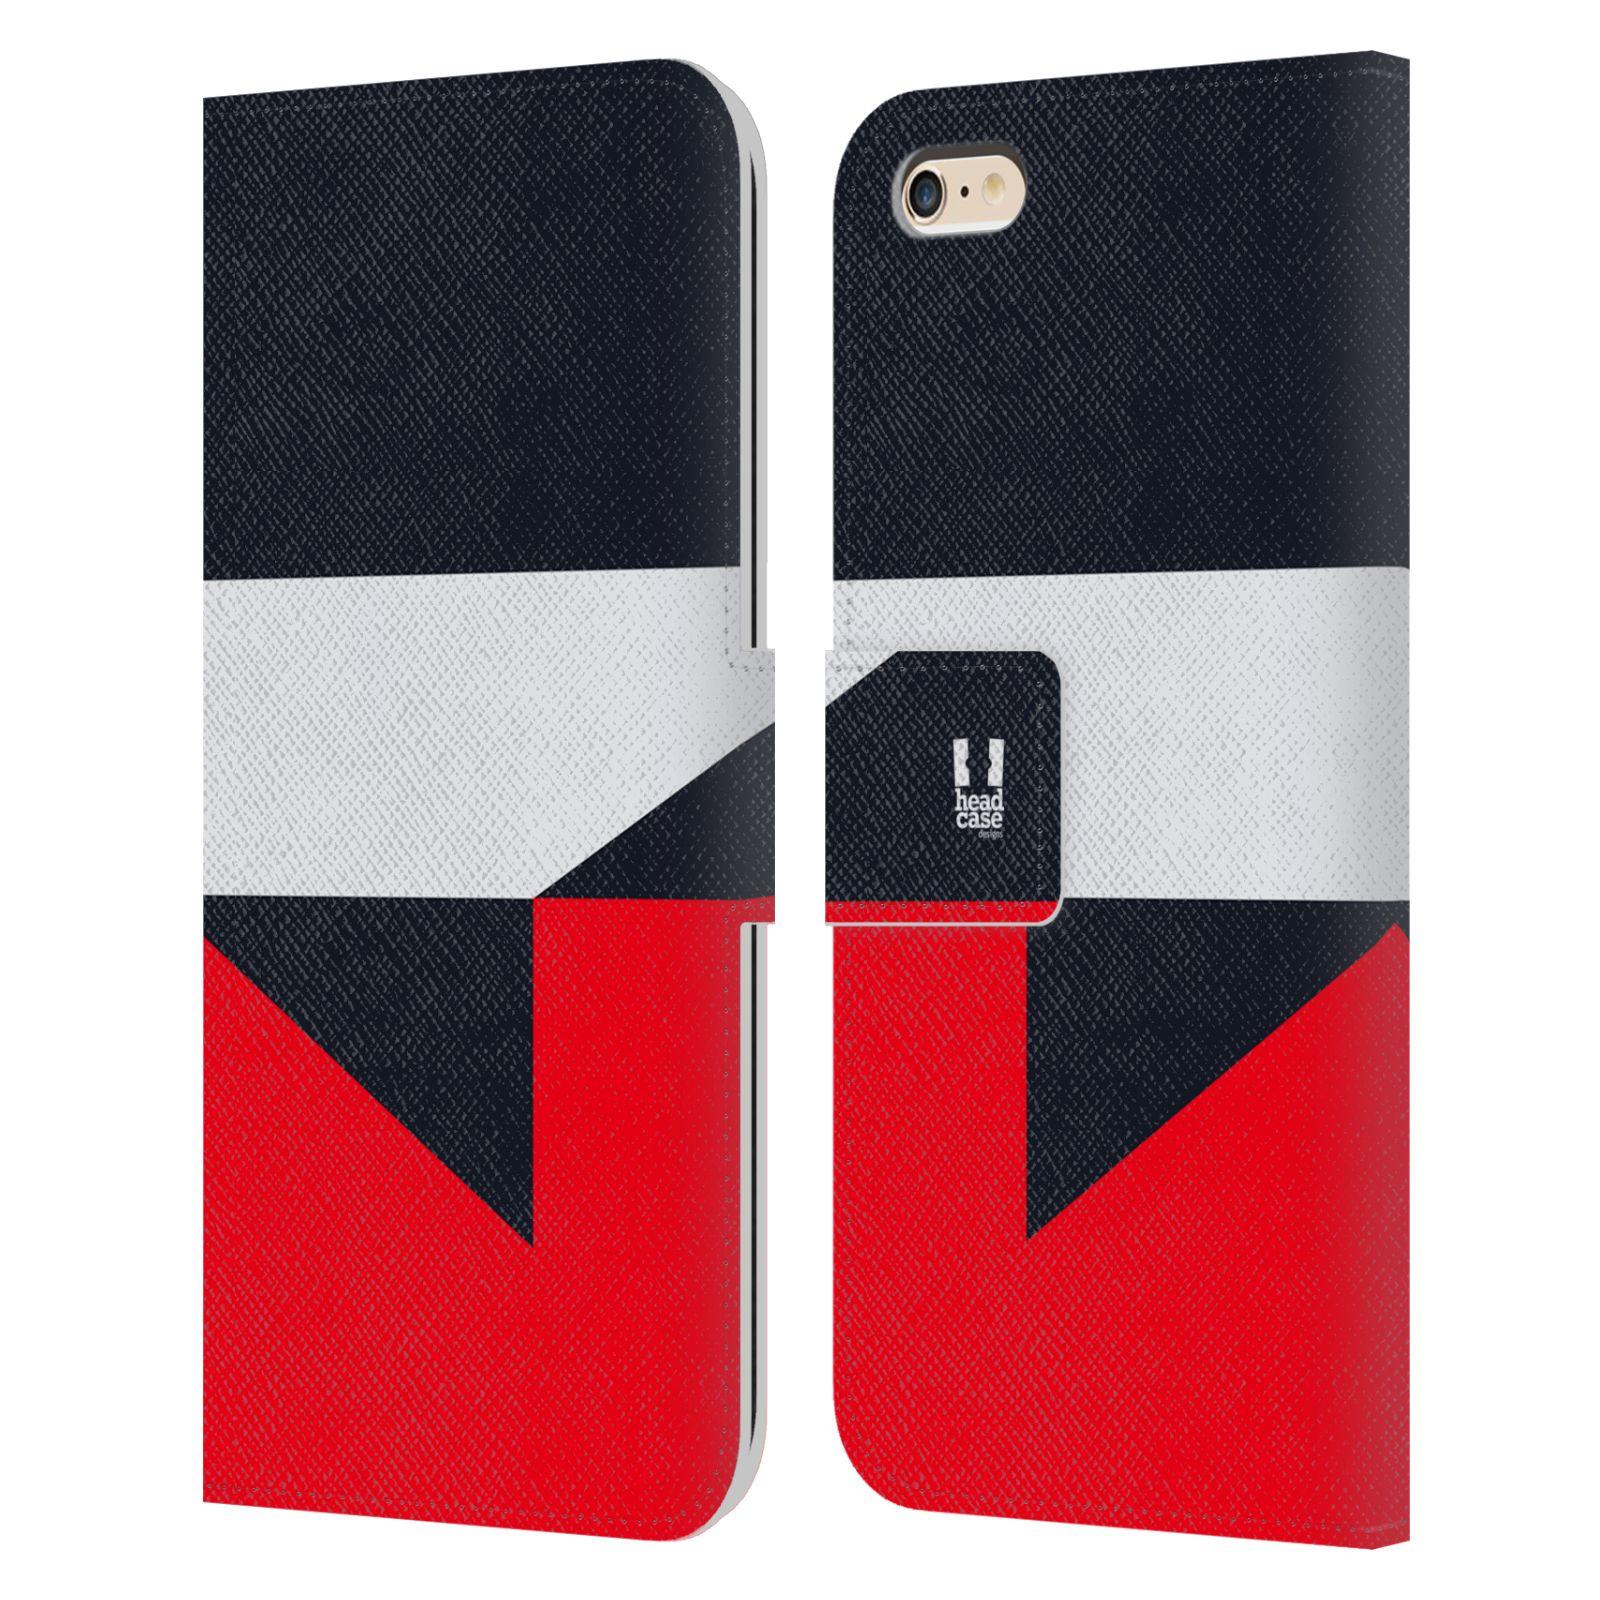 HEAD CASE Flipové pouzdro pro mobil Apple Iphone 6 PLUS/6S PLUS barevné tvary černá a červená gejša